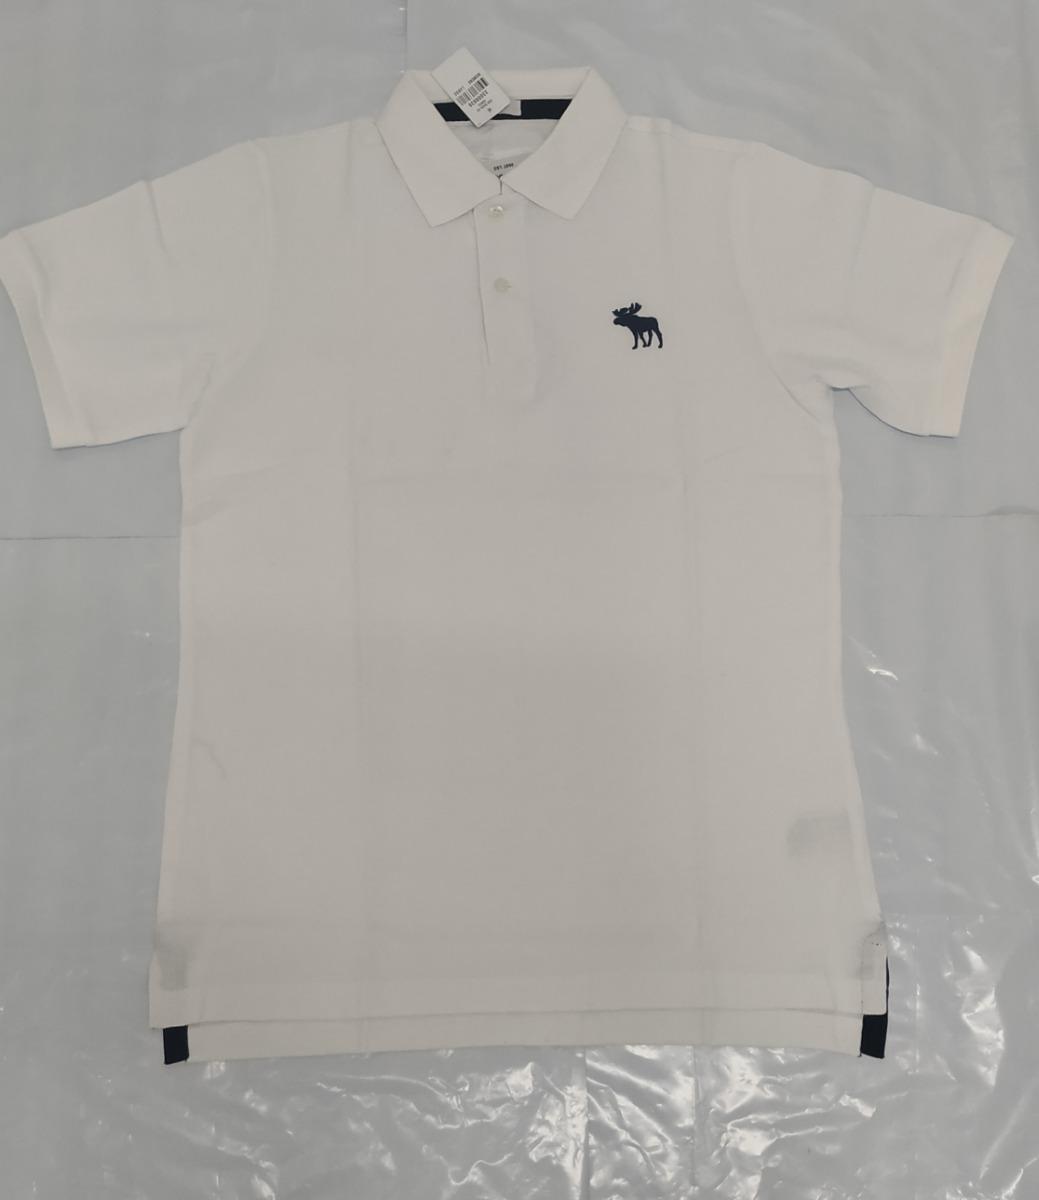 1c0a779eae ... b7a4e7f8ba3 camiseta polo abercrombie fitch - exclusivo eua(alce). Carregando  zoom.